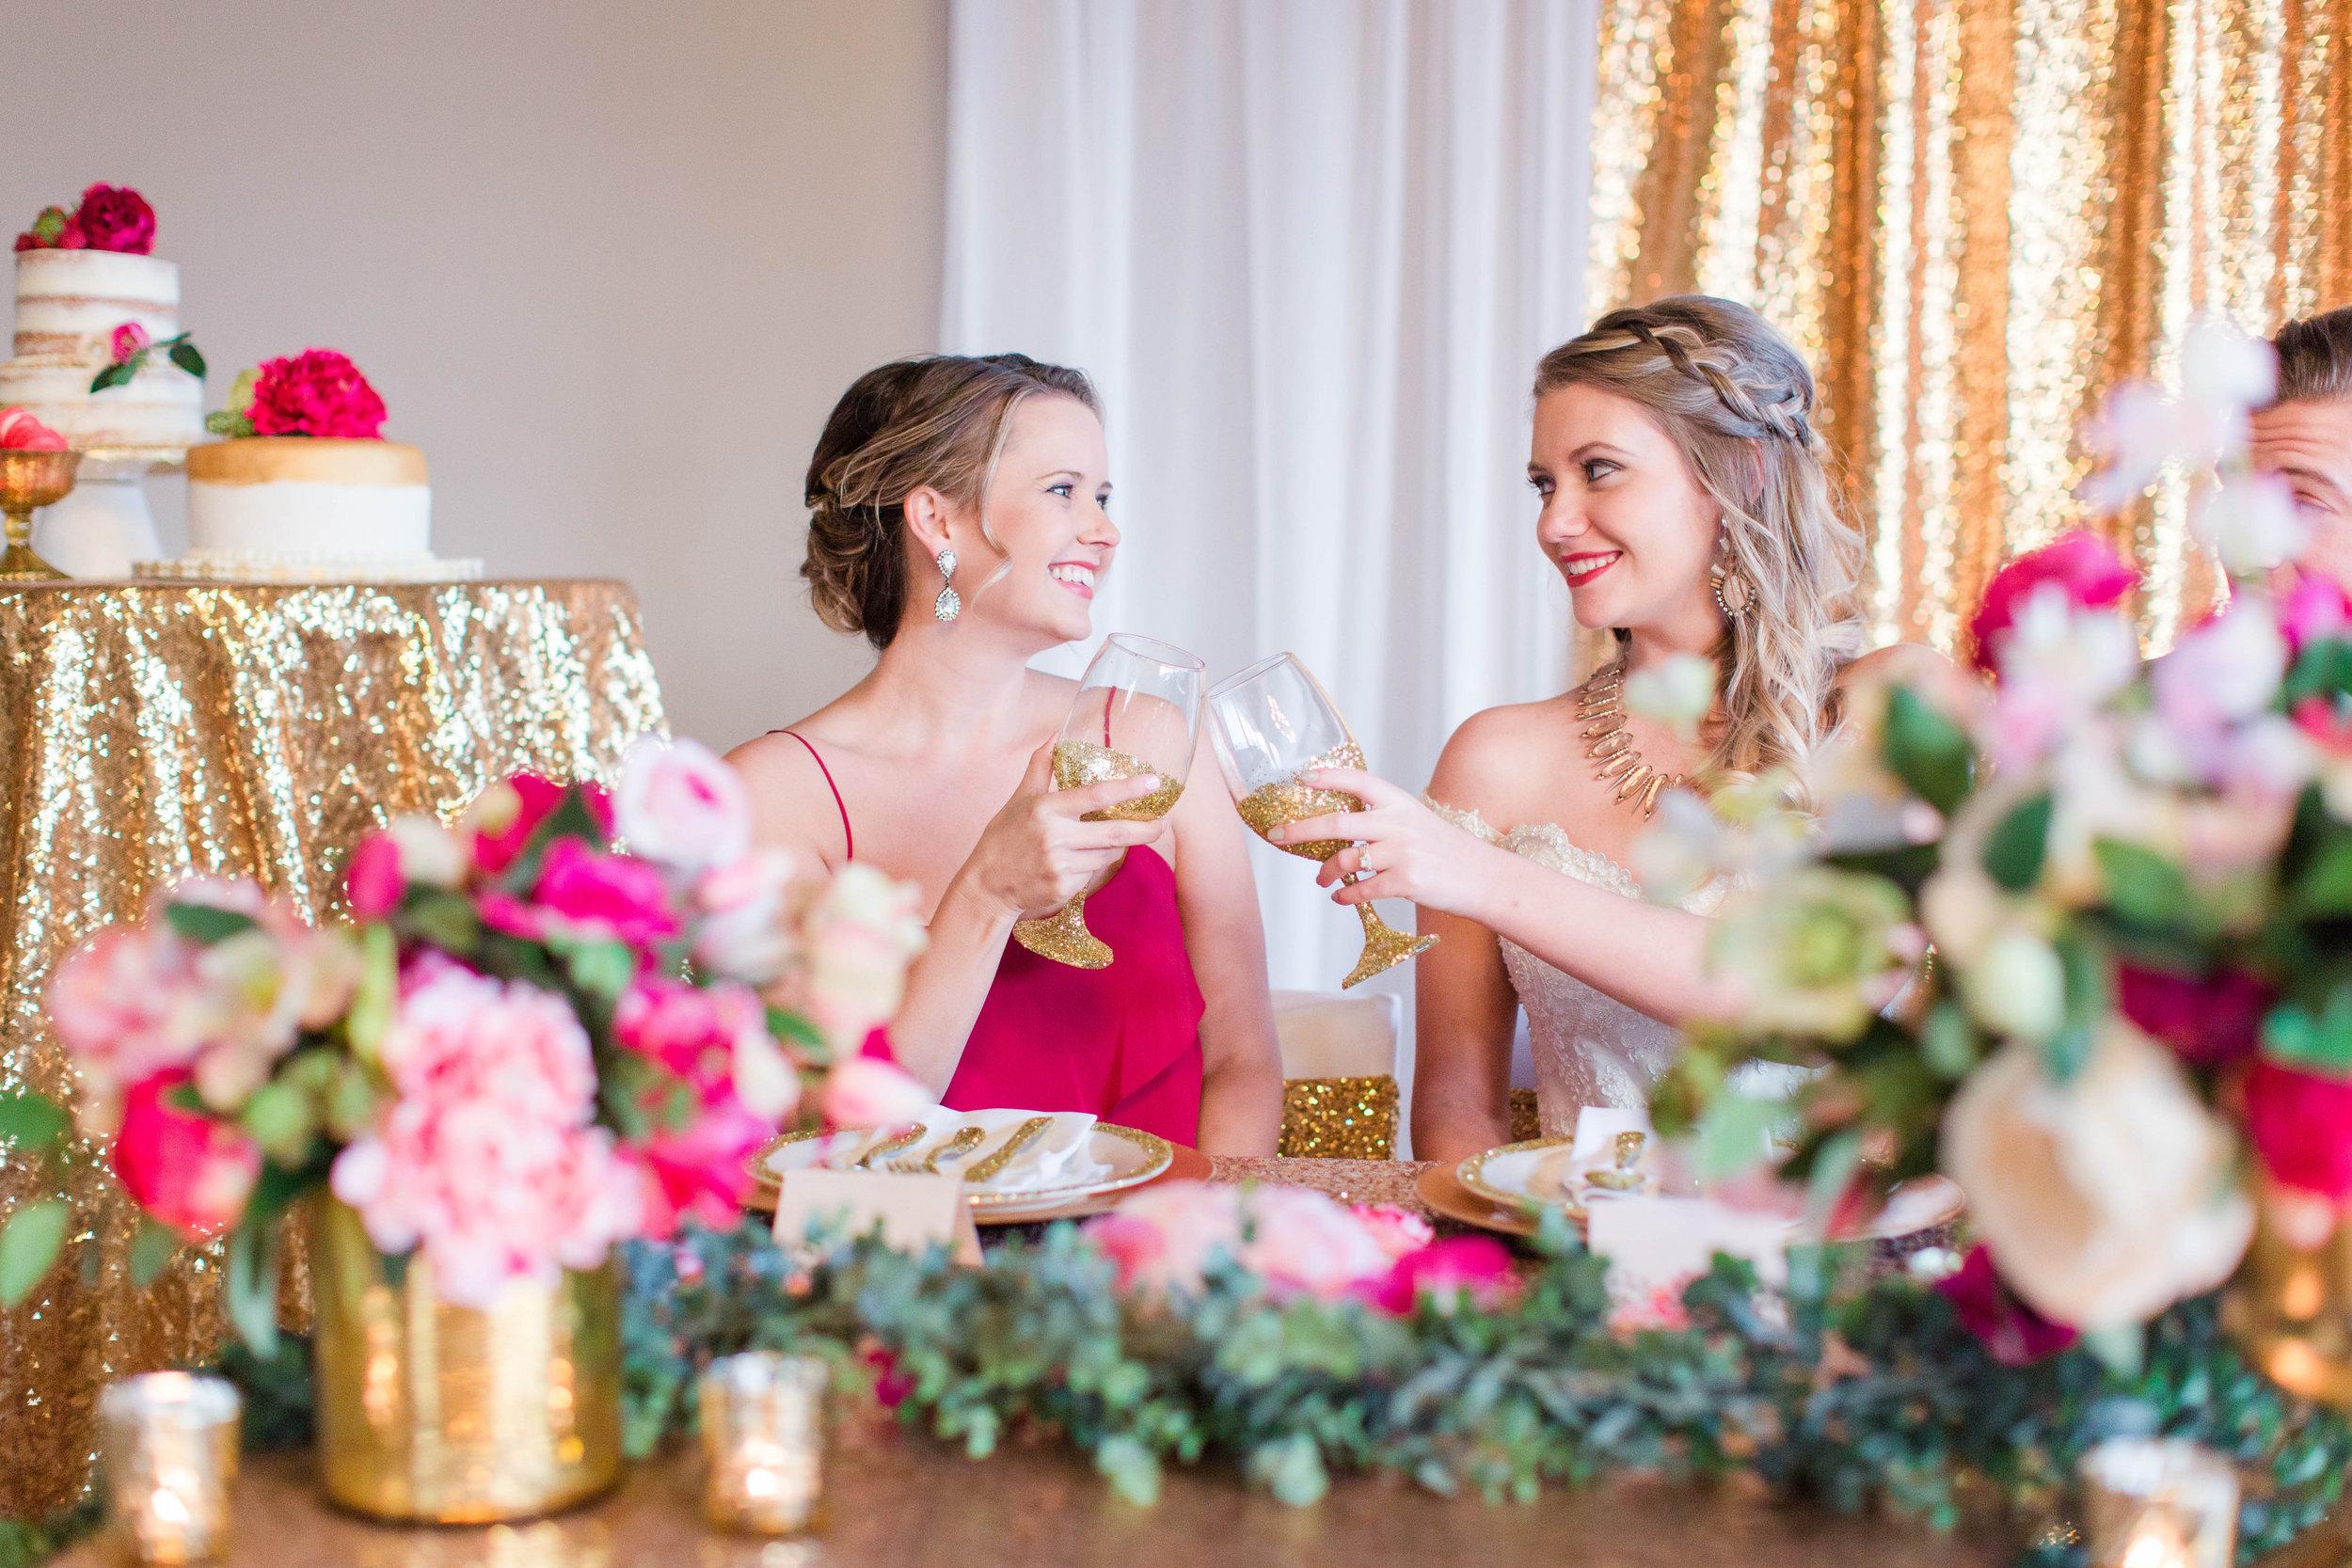 afloral-fake-flower-wedding-ivory-and-beau-bridal-boutique-maggie-sottero-saffron-the-hall-on-vine-wedding-statesboro-wedding-savannah-wedding-kristian-designs-rachel-strickland-photography-savannah-bridal-southern-bride-savannah-bride-26.jpg